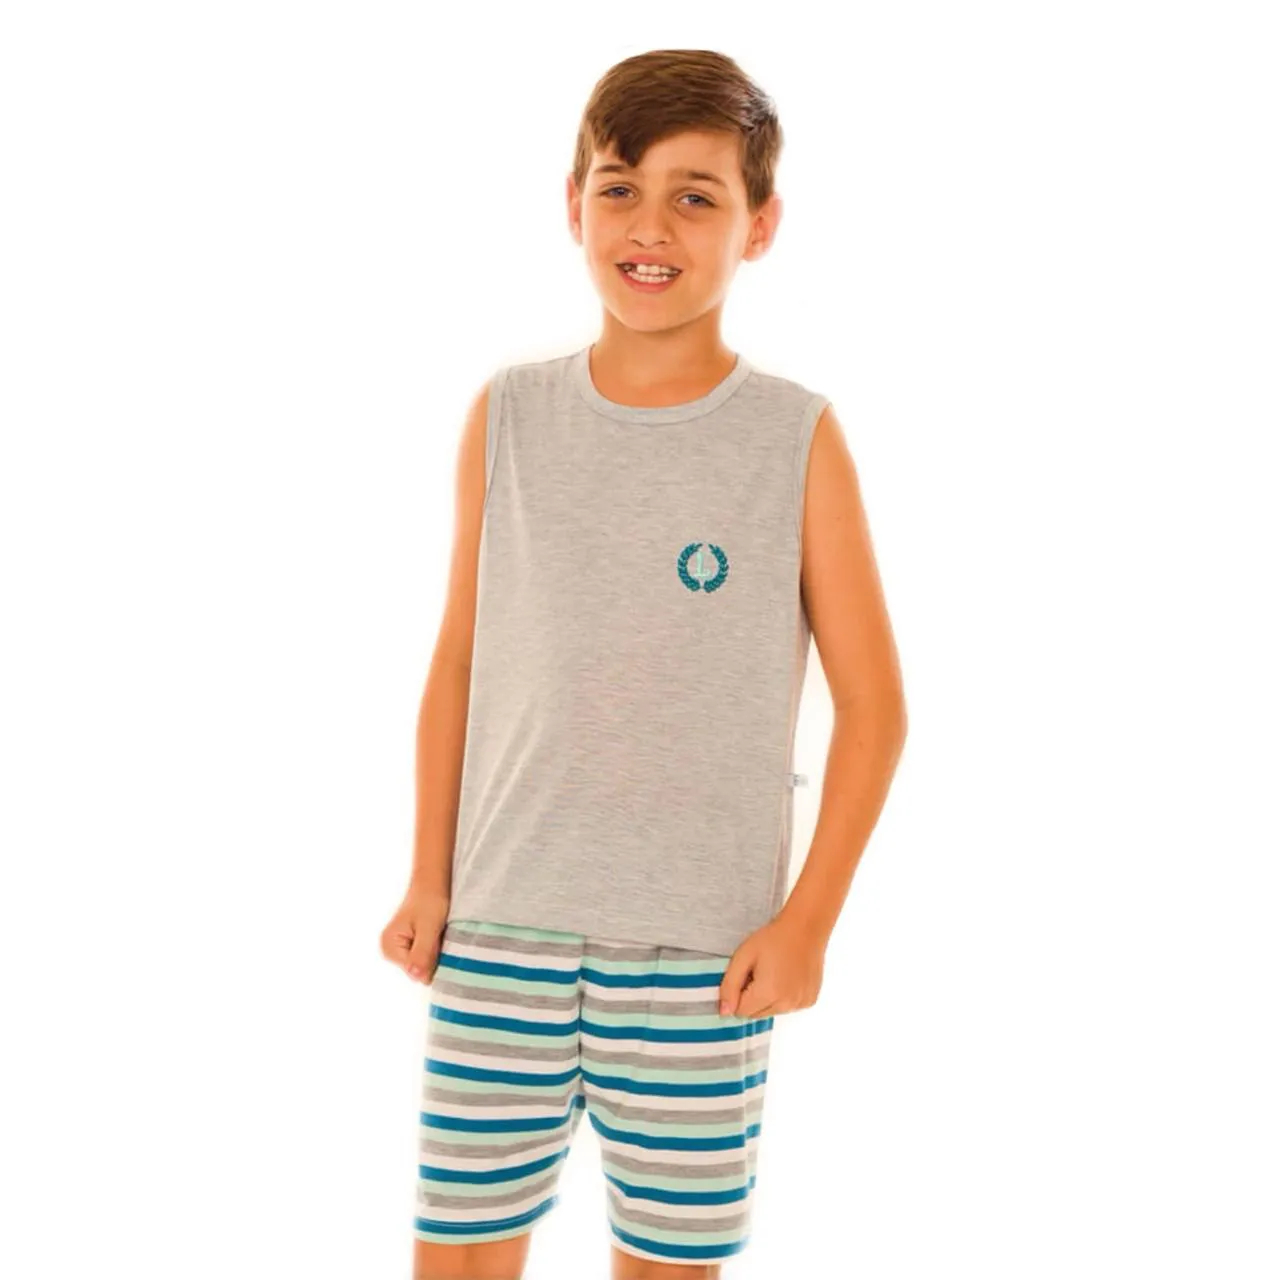 Pijama Infantil Regata Listra   - RMCE BRAZIL